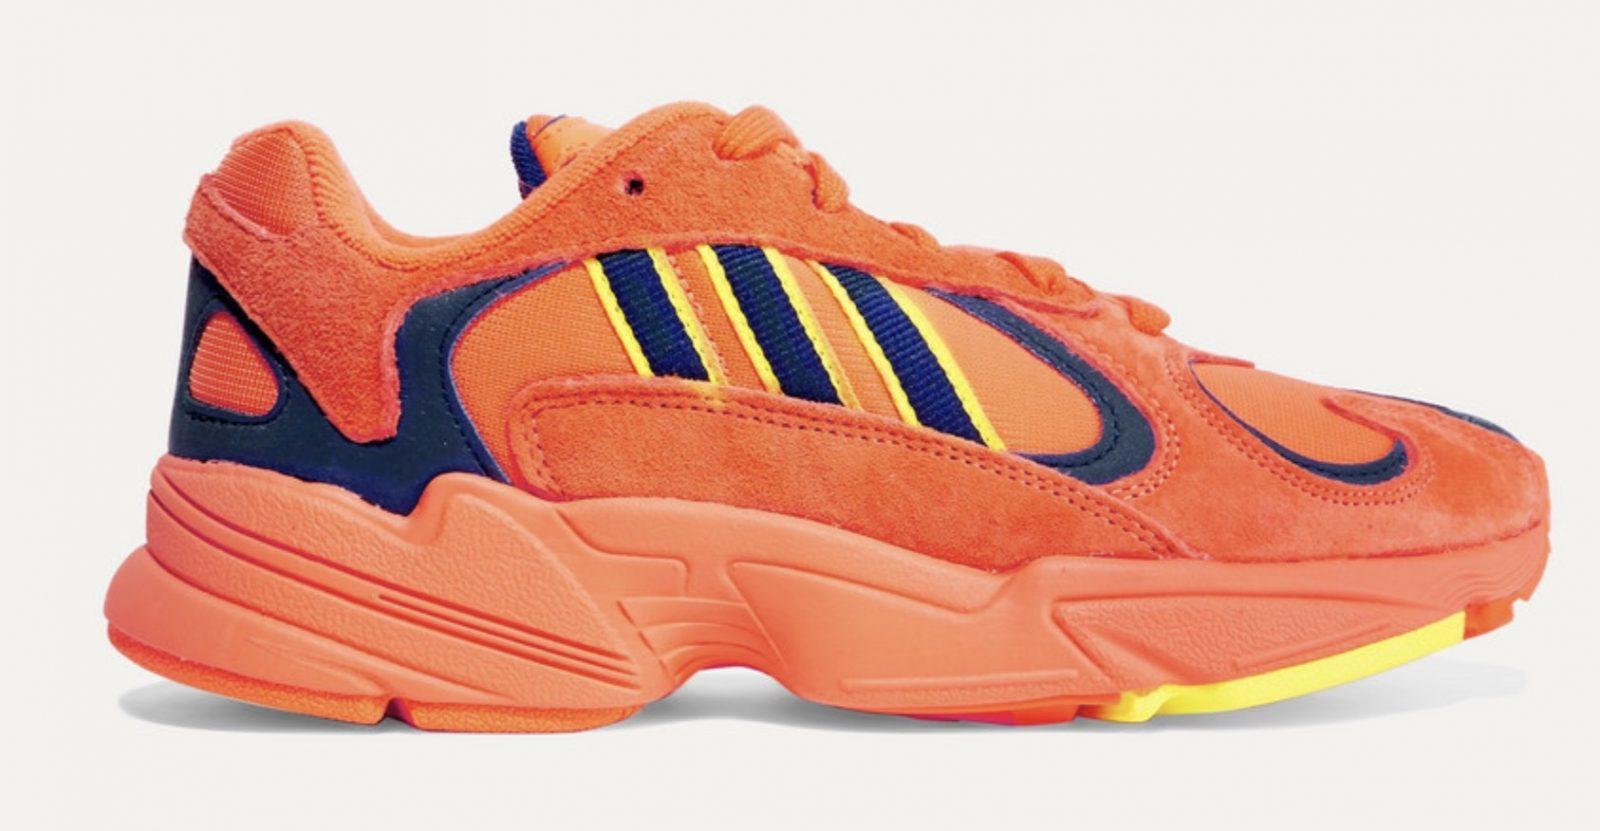 adidas Yung 1 Orange Blue